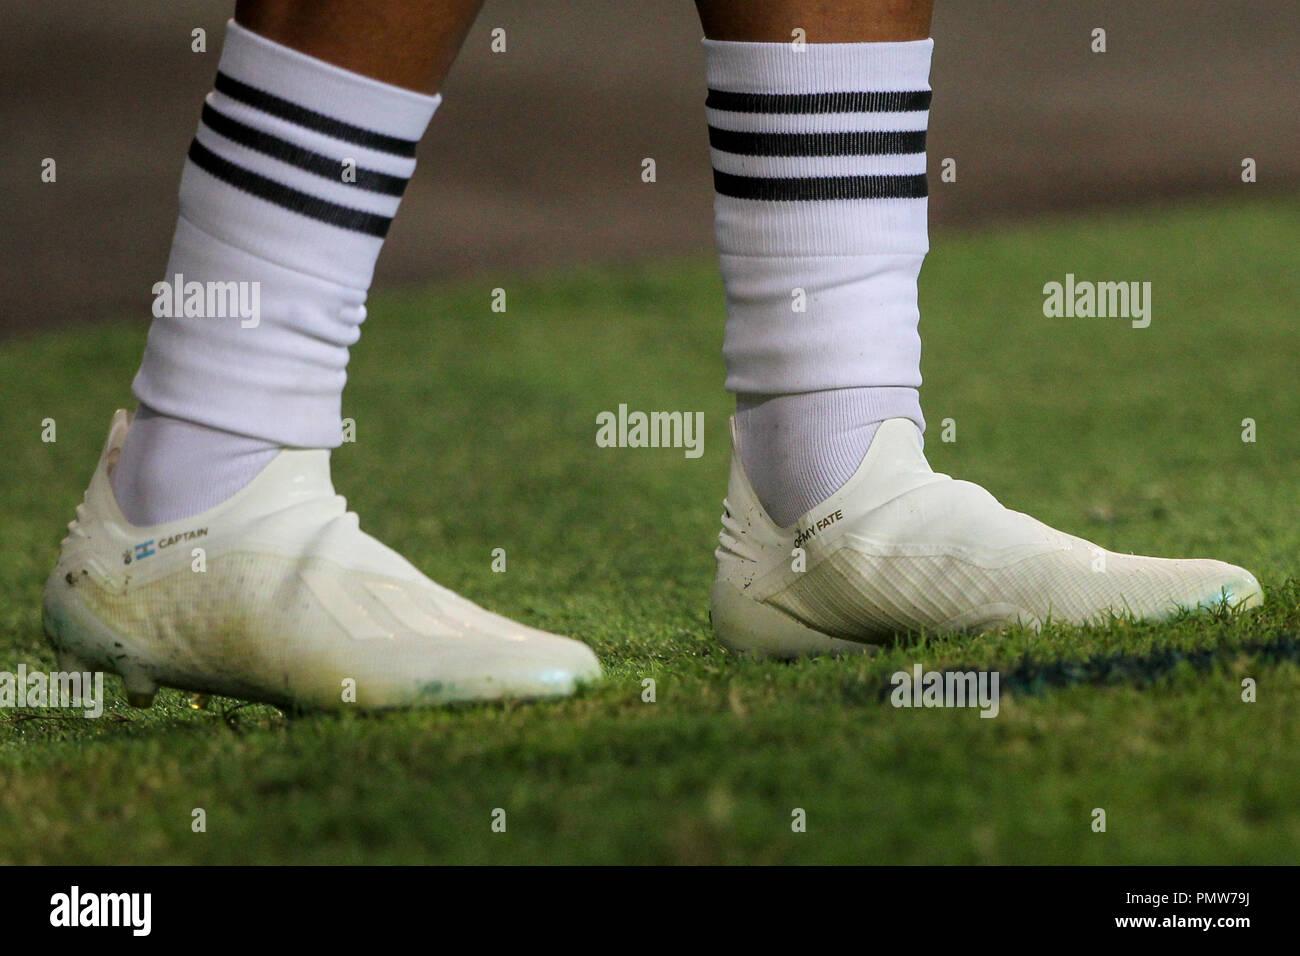 987a3d7cf Juventus Valencia Stock Photos   Juventus Valencia Stock Images - Alamy